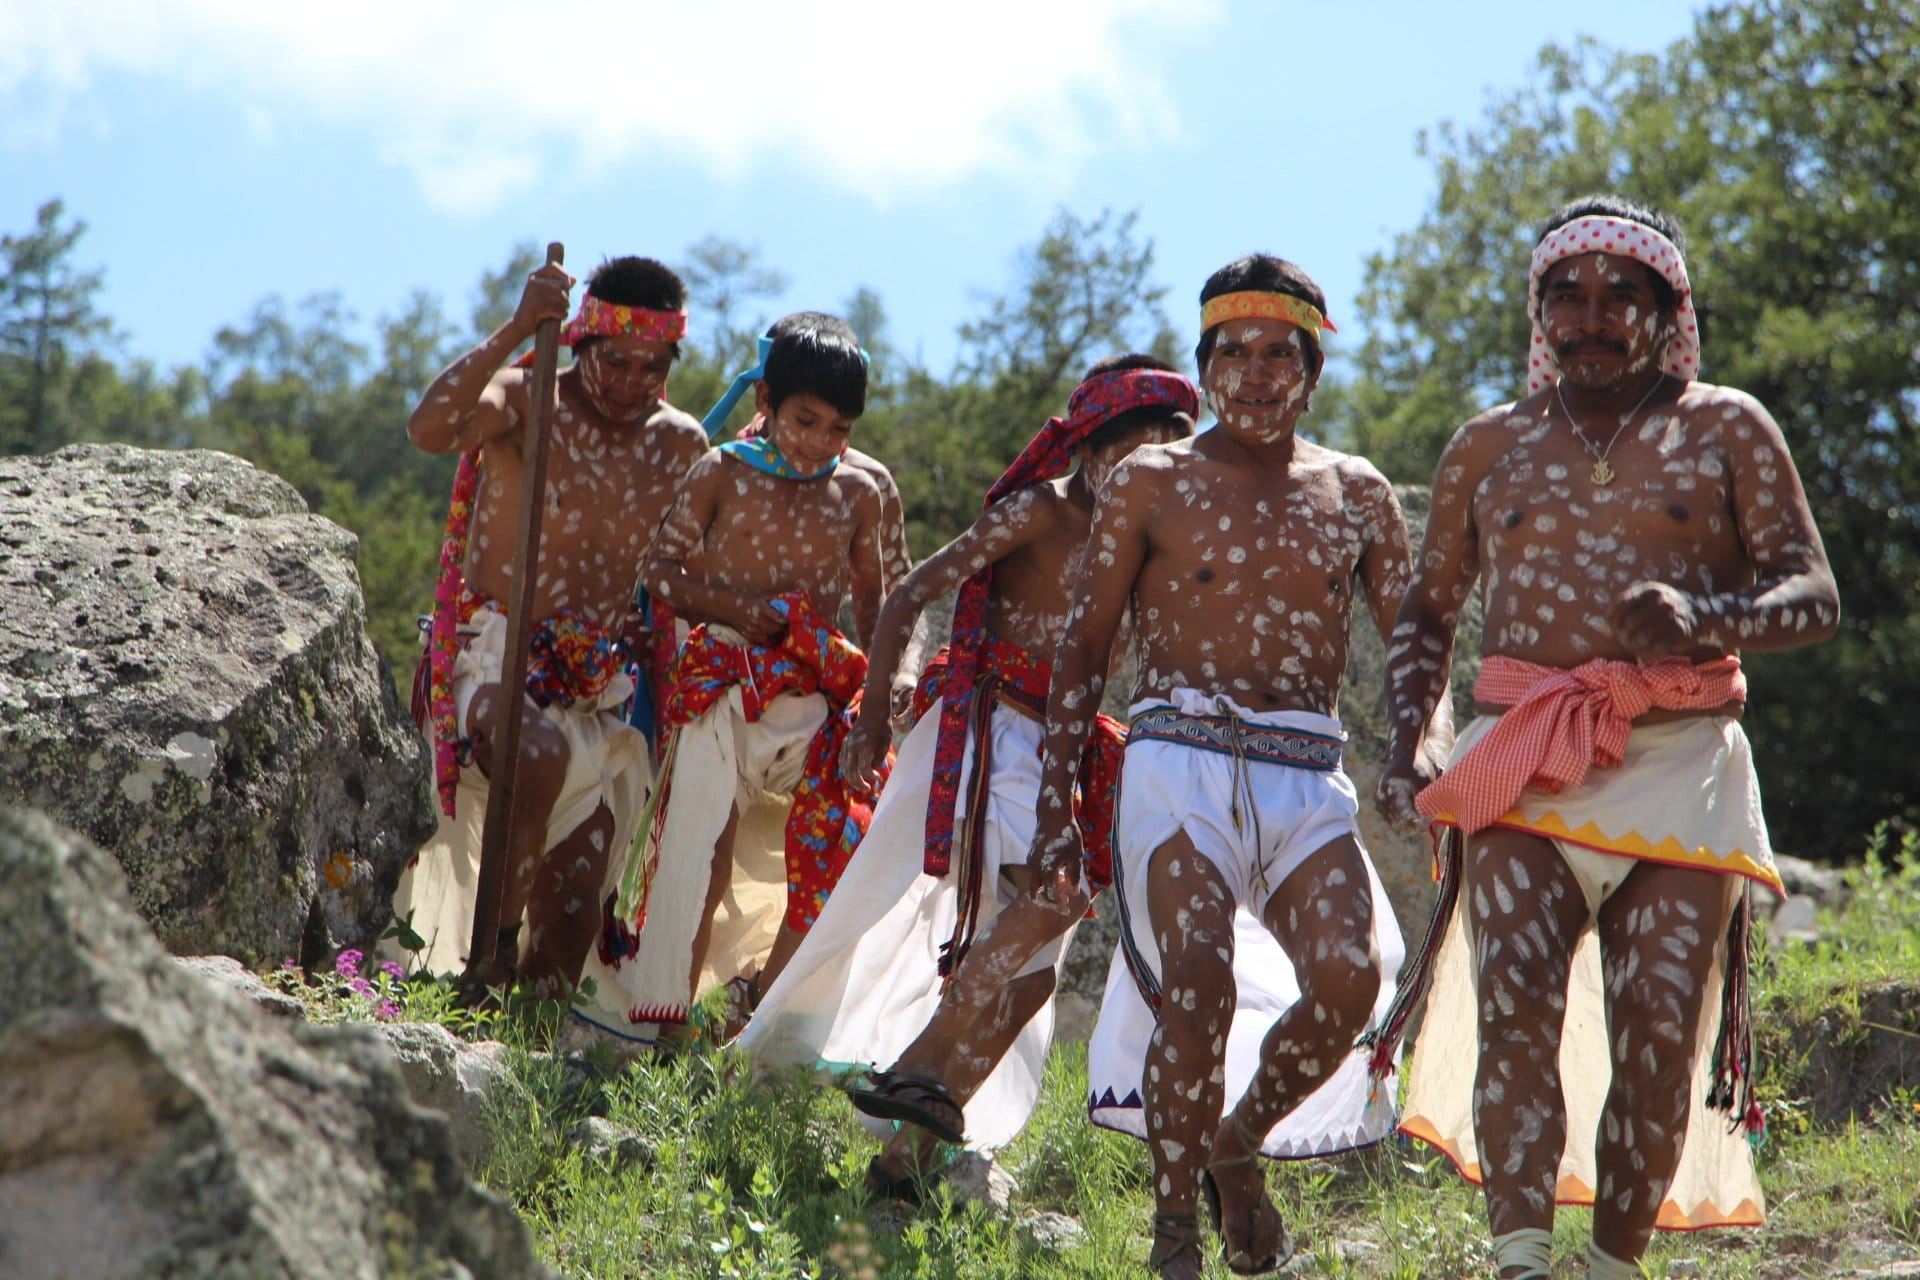 Tarahumaras Papajichi Filmacion 17 y 18 julio 2014